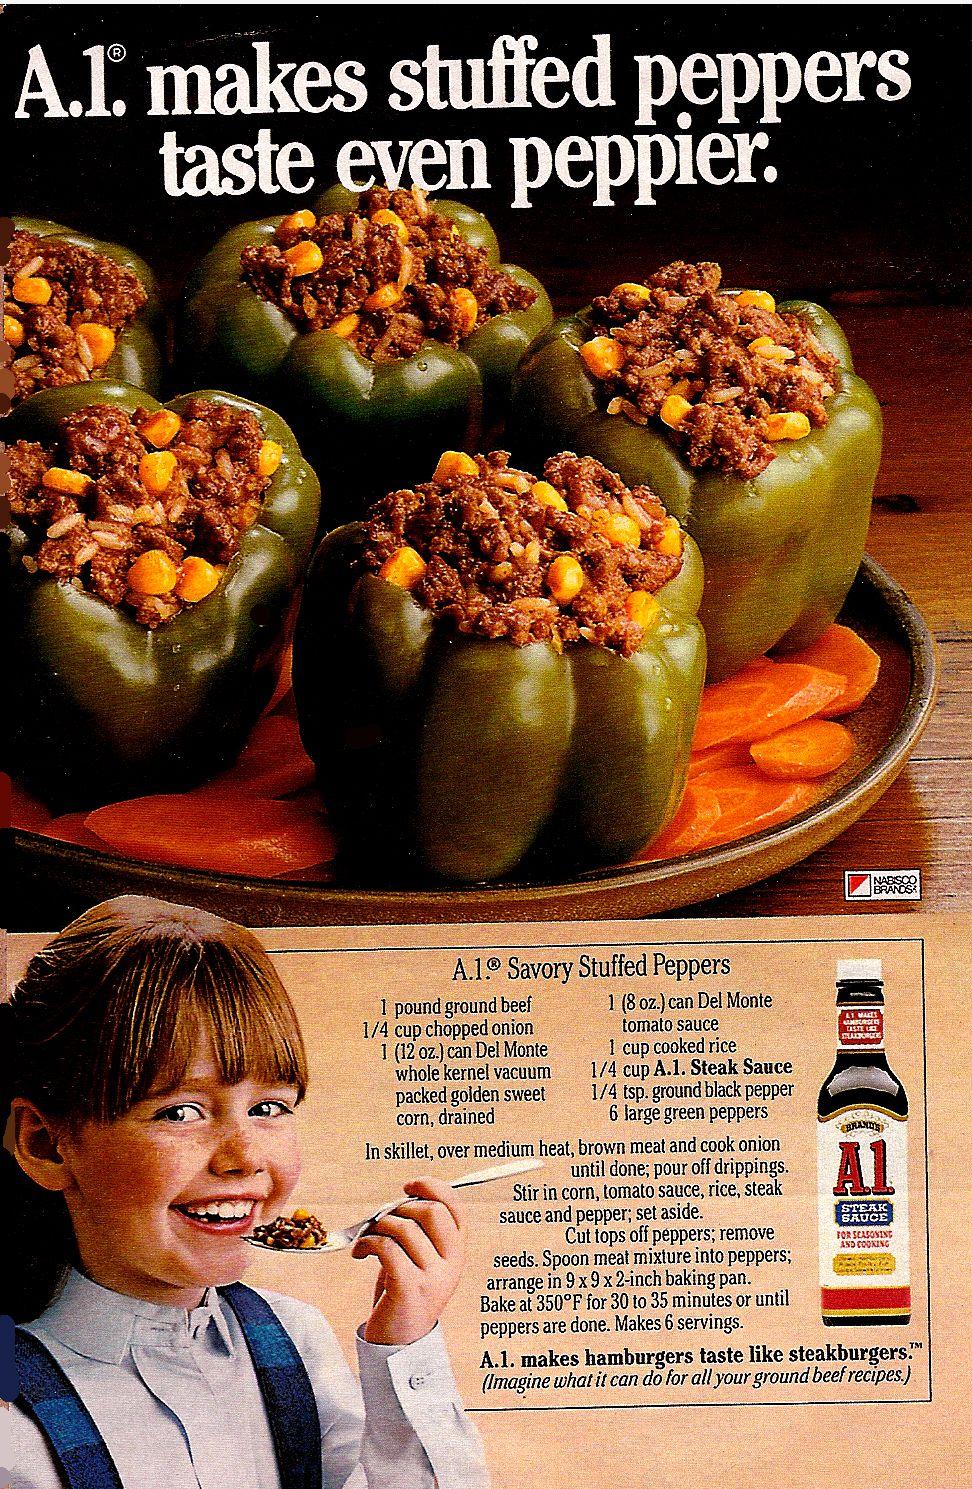 A1 Savory Stuffed Peppers Vintage Again I 3 Vintage Recipes Stuffed Peppers Vintage Recipes Retro Recipes